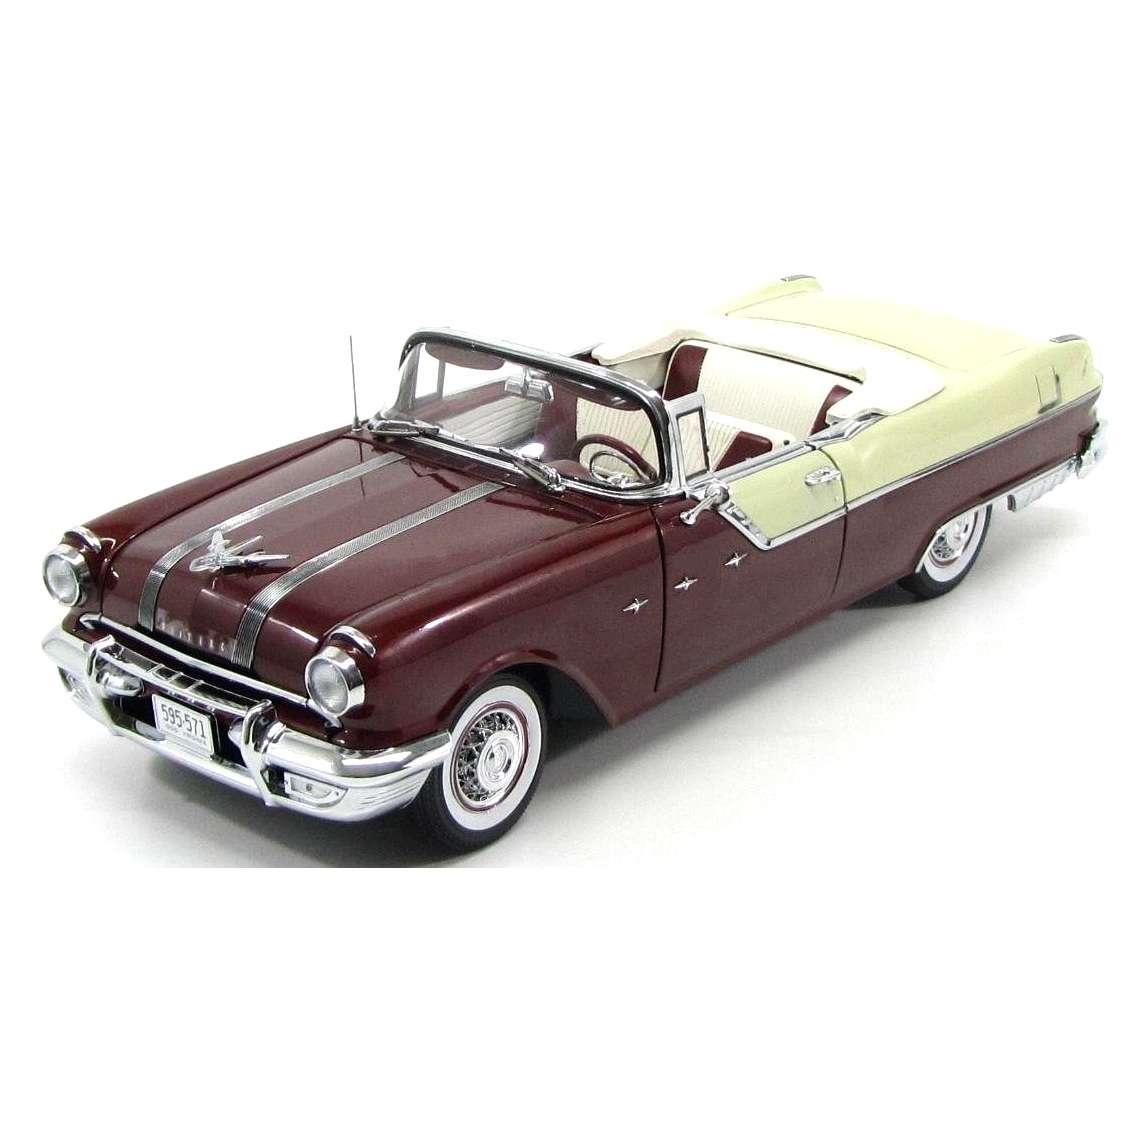 Diecast Car 1/18: Street Cars - Pontiac Star Chief Covertible, 1955 Photo